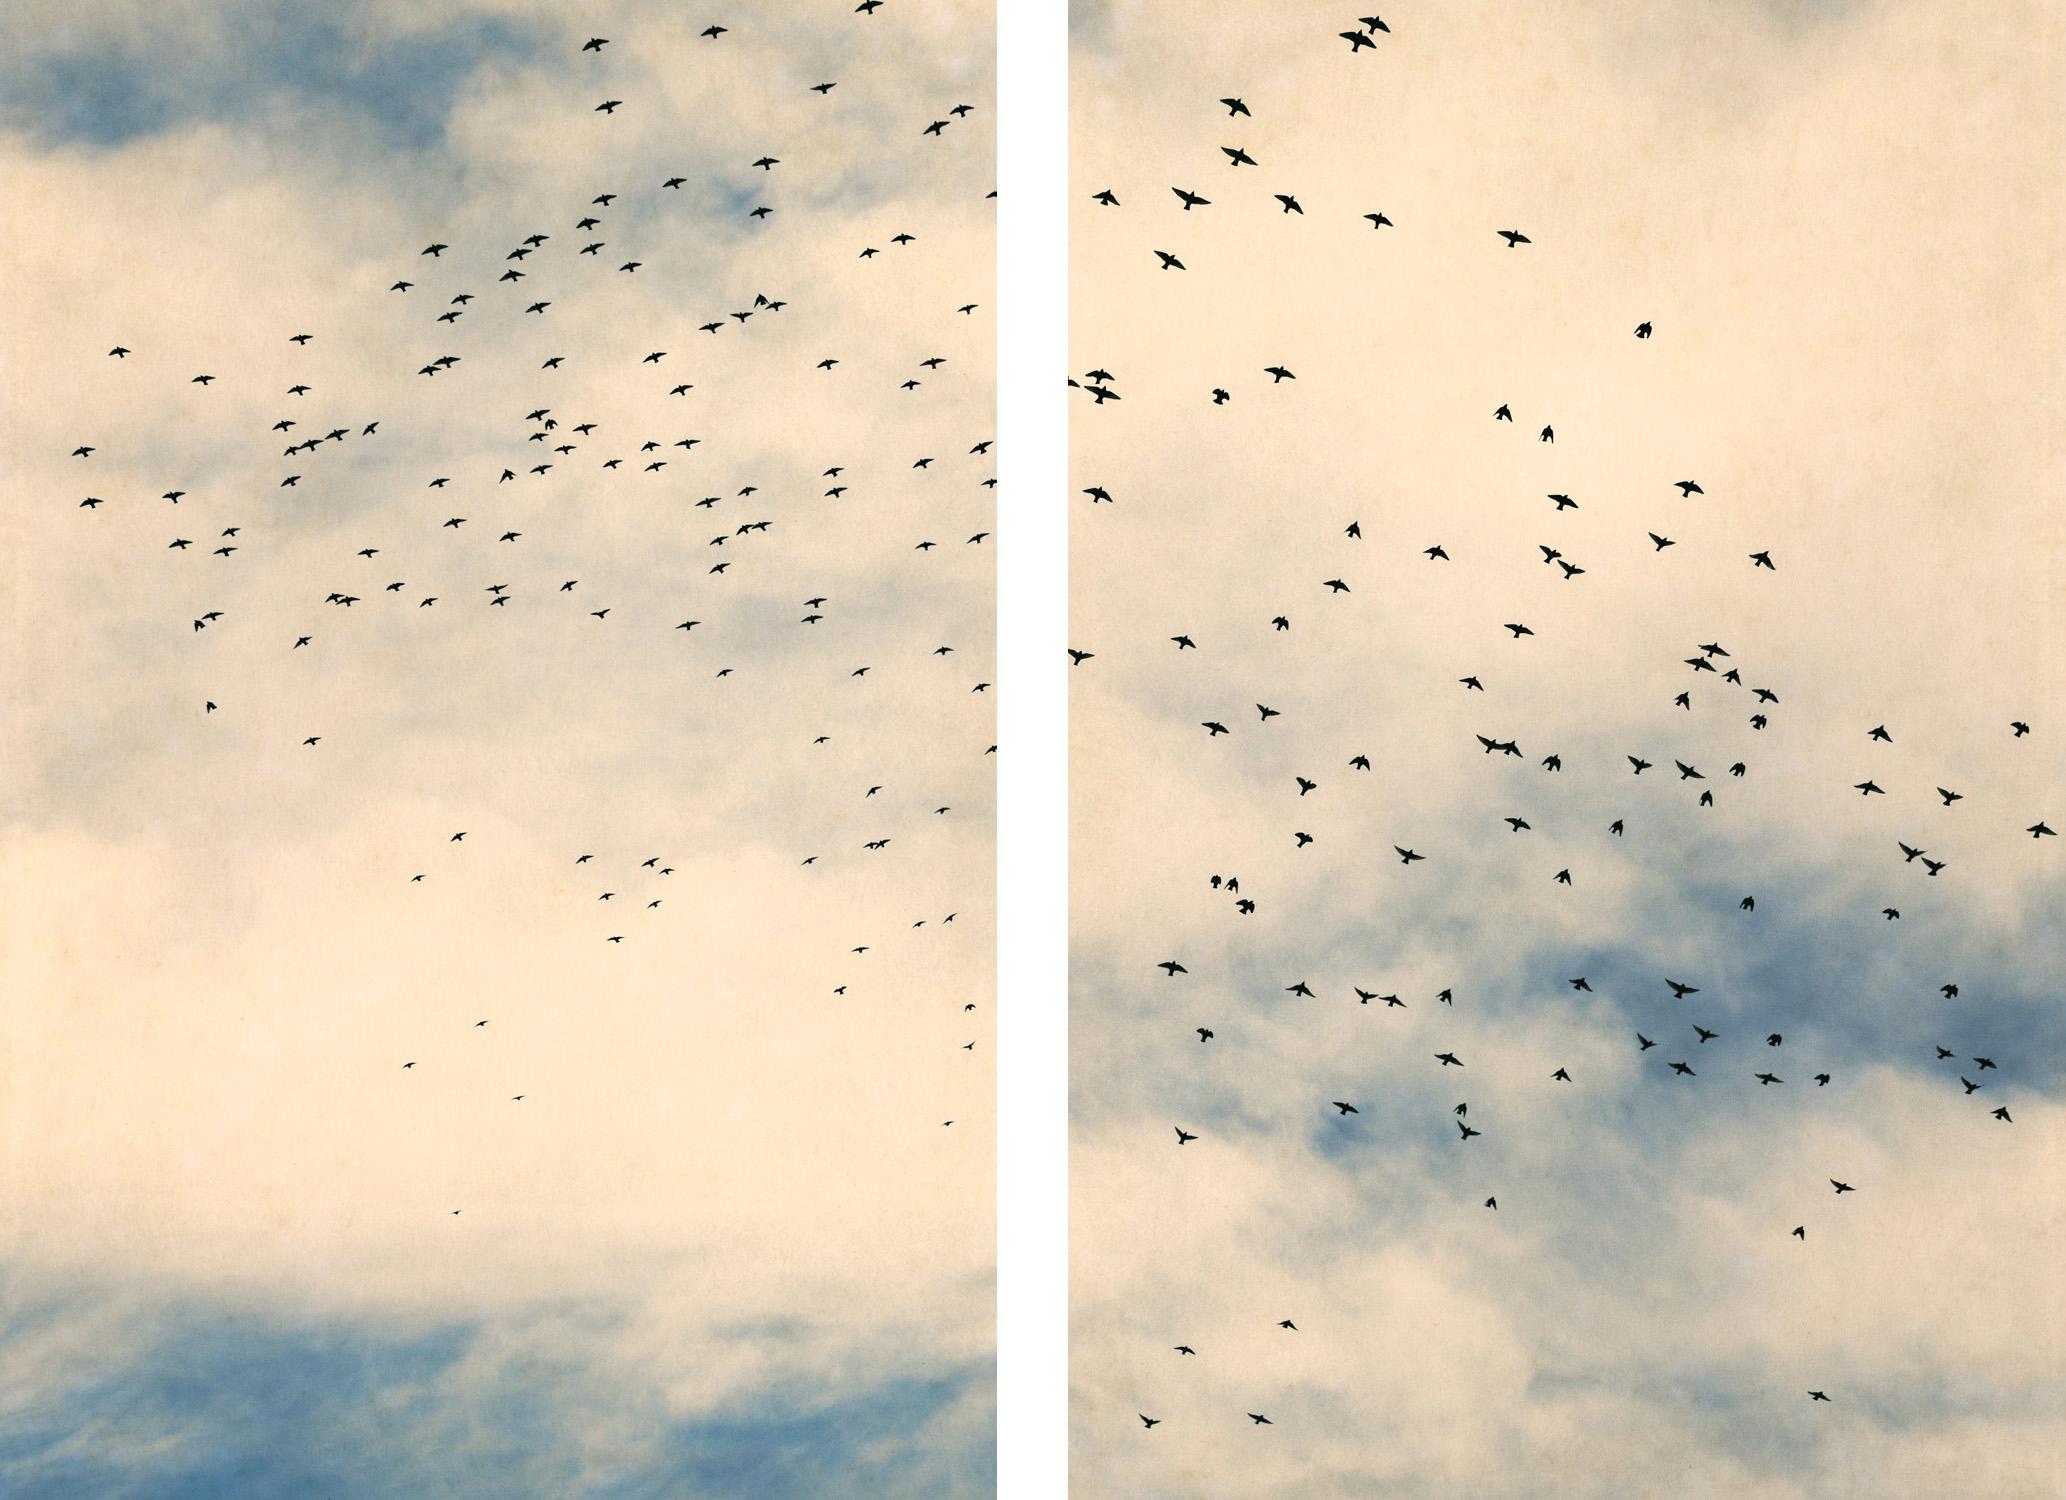 Starlings and Sky iii & iv